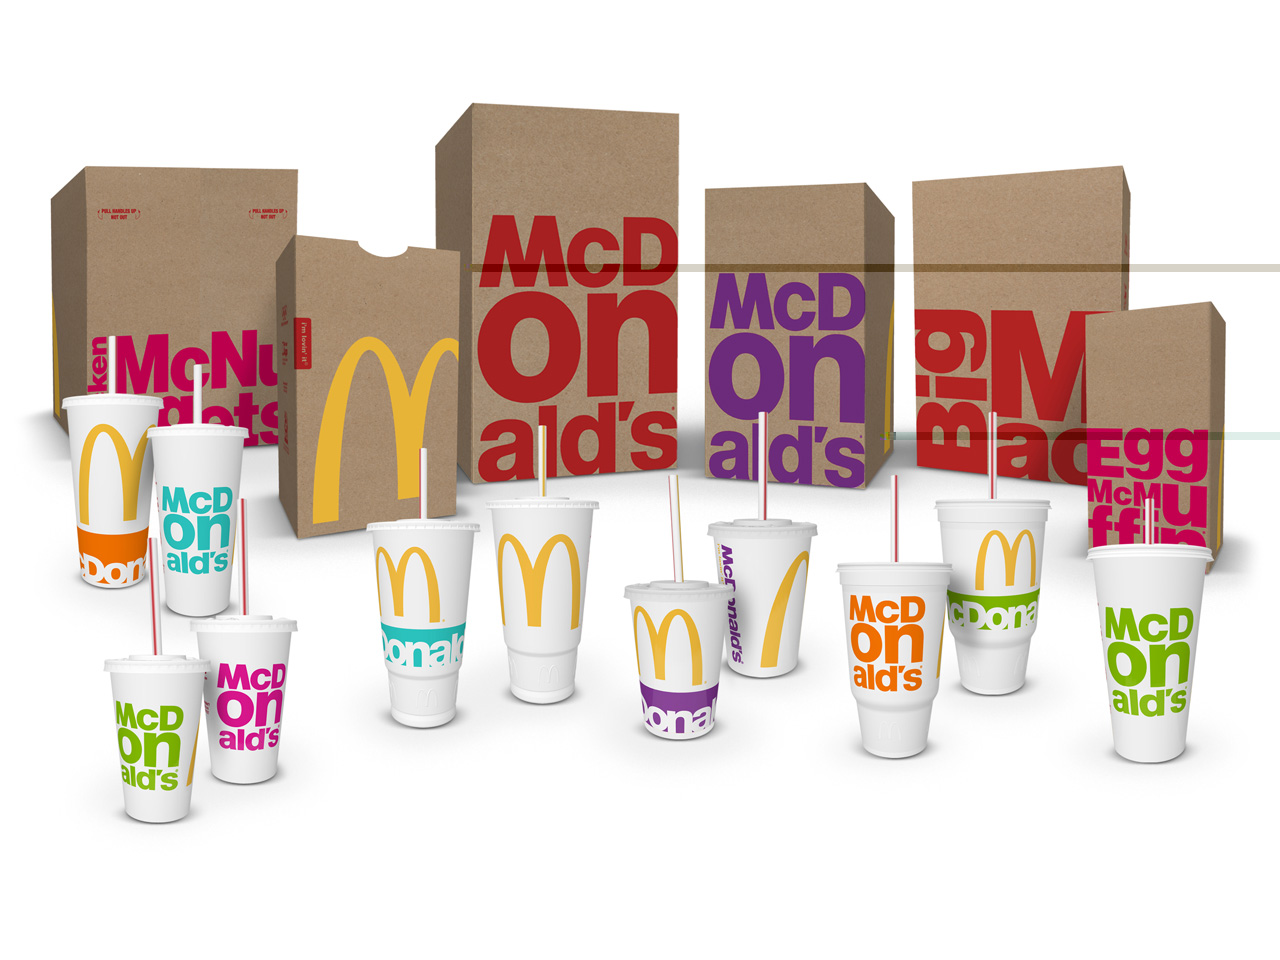 mcdonalds-packaging-2016